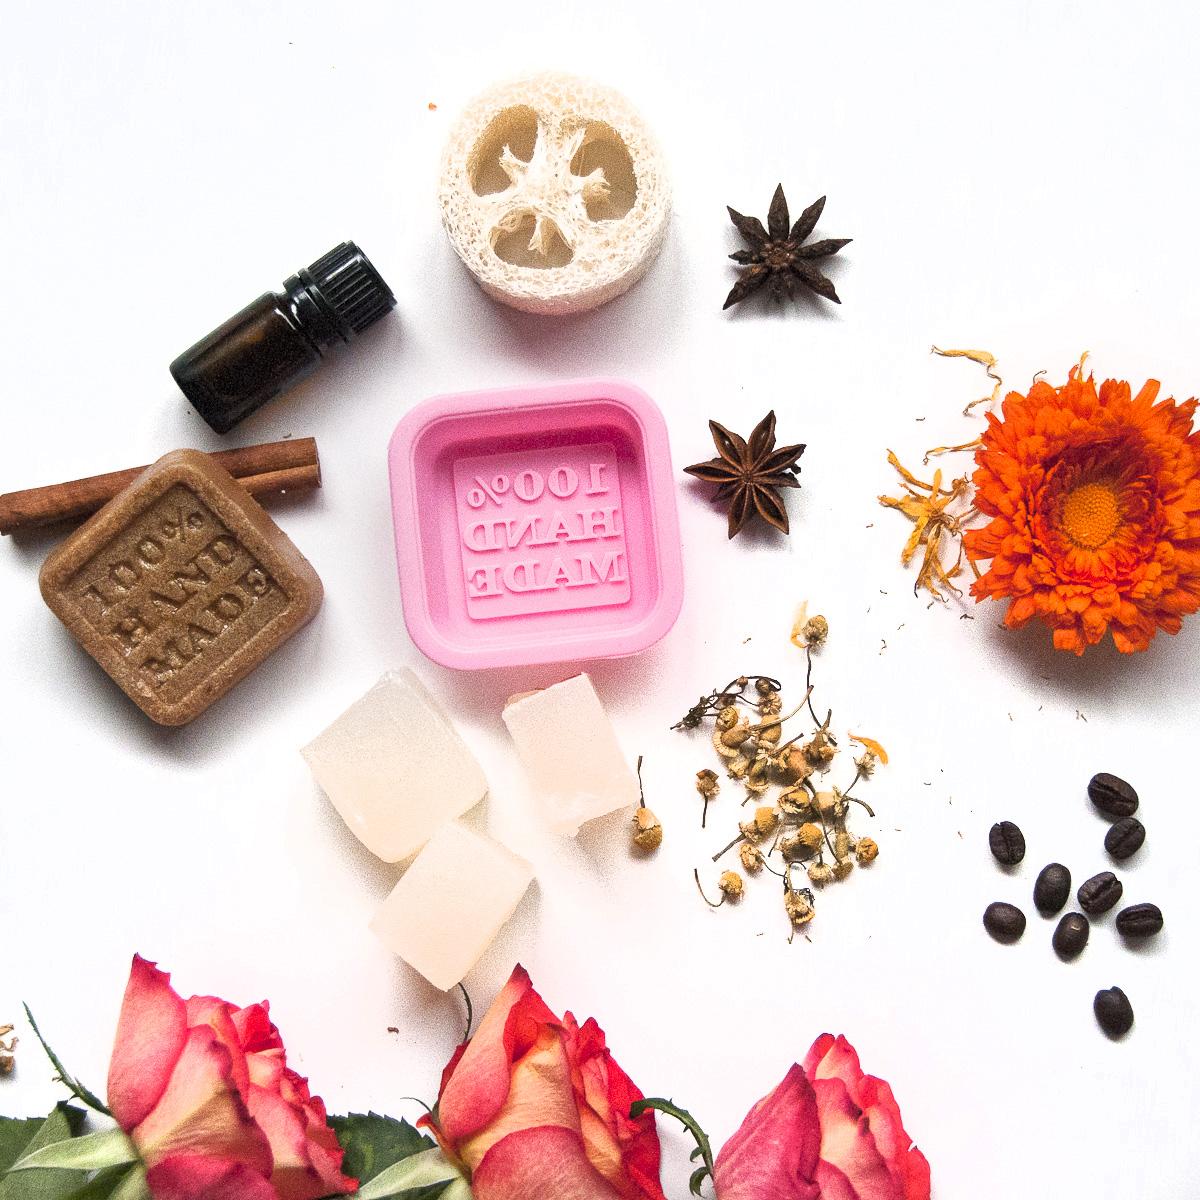 DIY Soap Kit Photoshoot